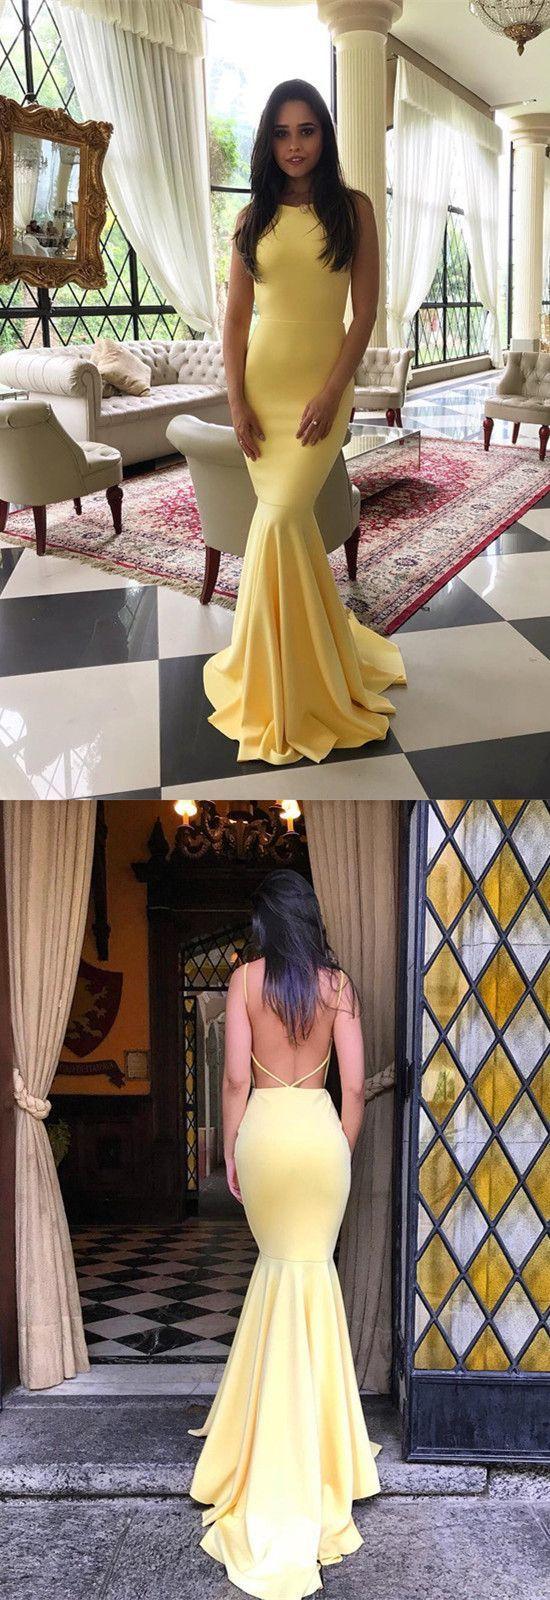 yellow prom dress,mermaid prom dress,mermaid evening dress,open back prom dress,prom long dresses,sexy prom dresses 2018 #longpromdresses